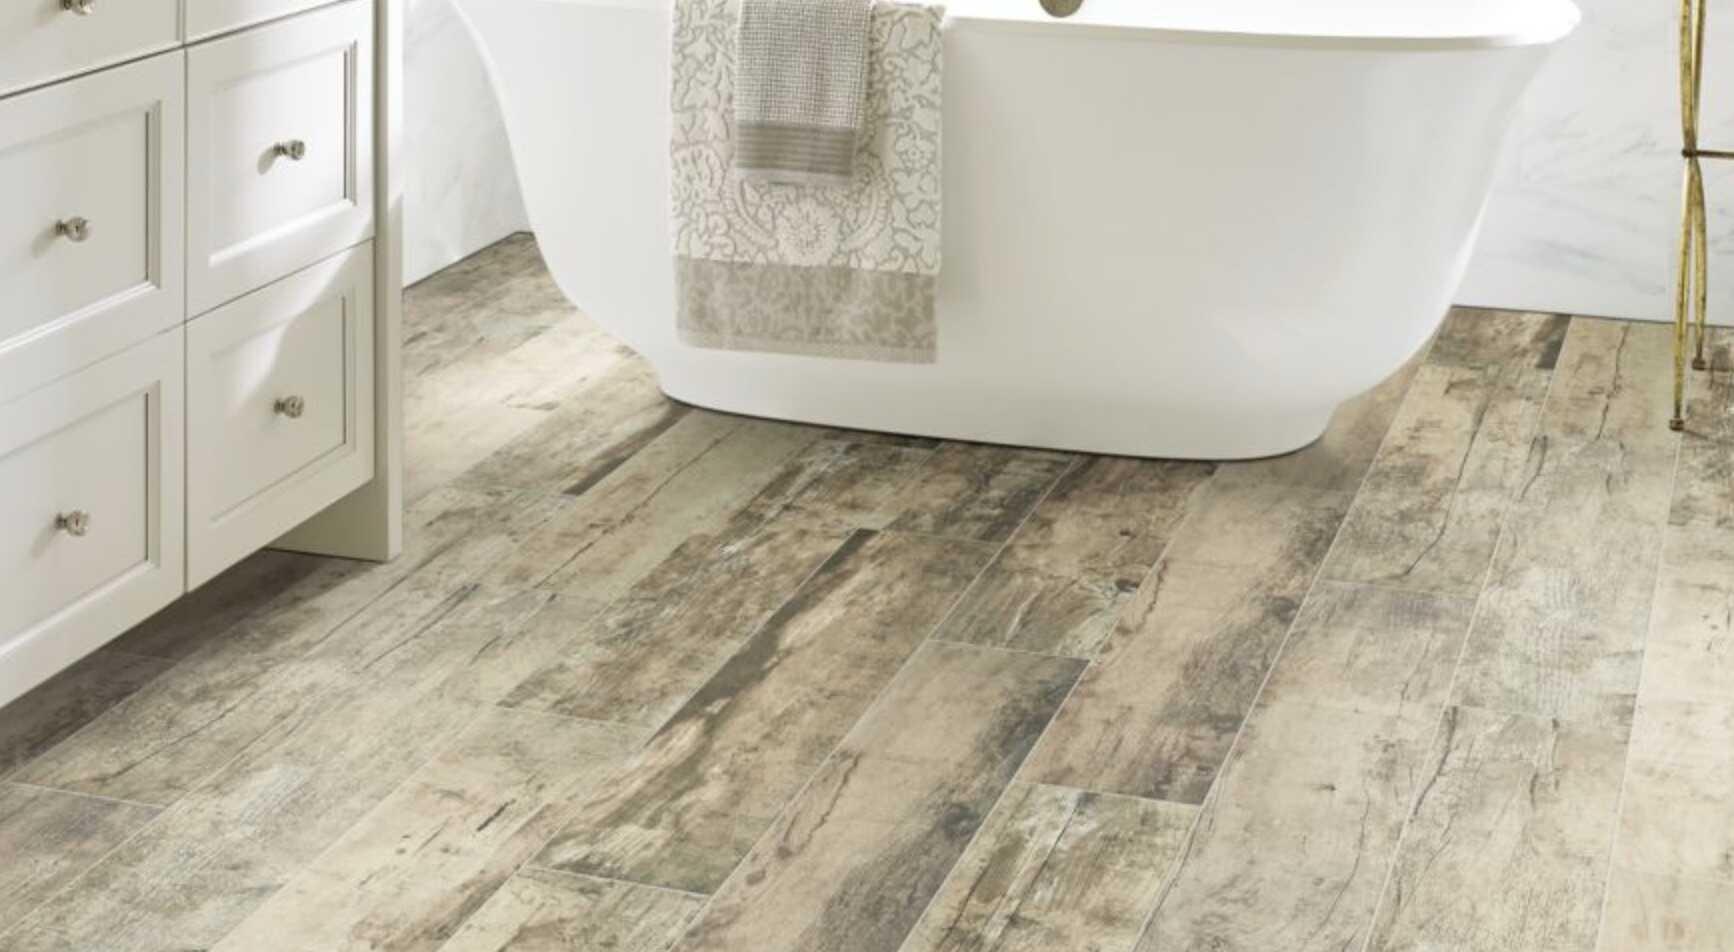 waterproof vinyl plank floorscapes inc